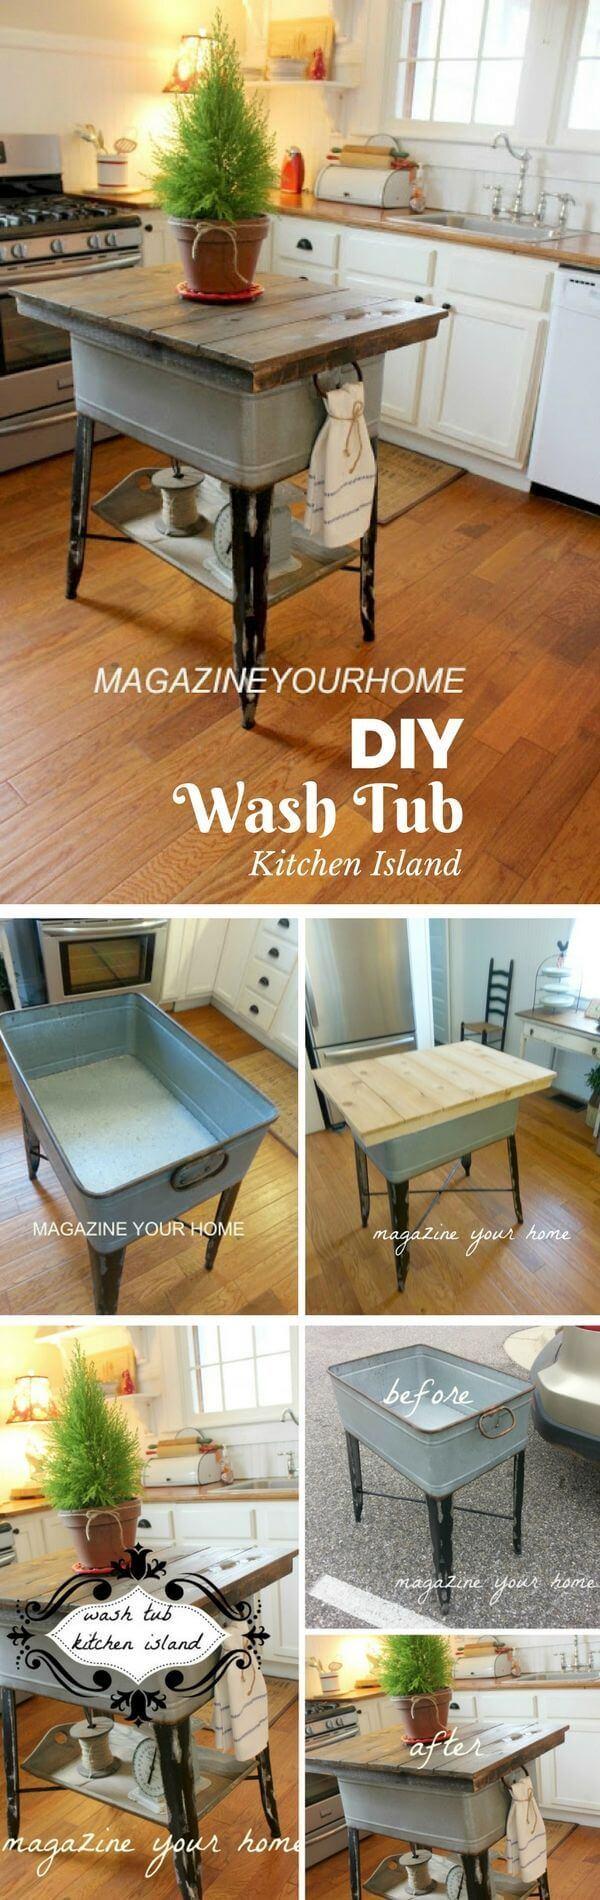 Whimsical Wash Tub Island for Country Home Charm